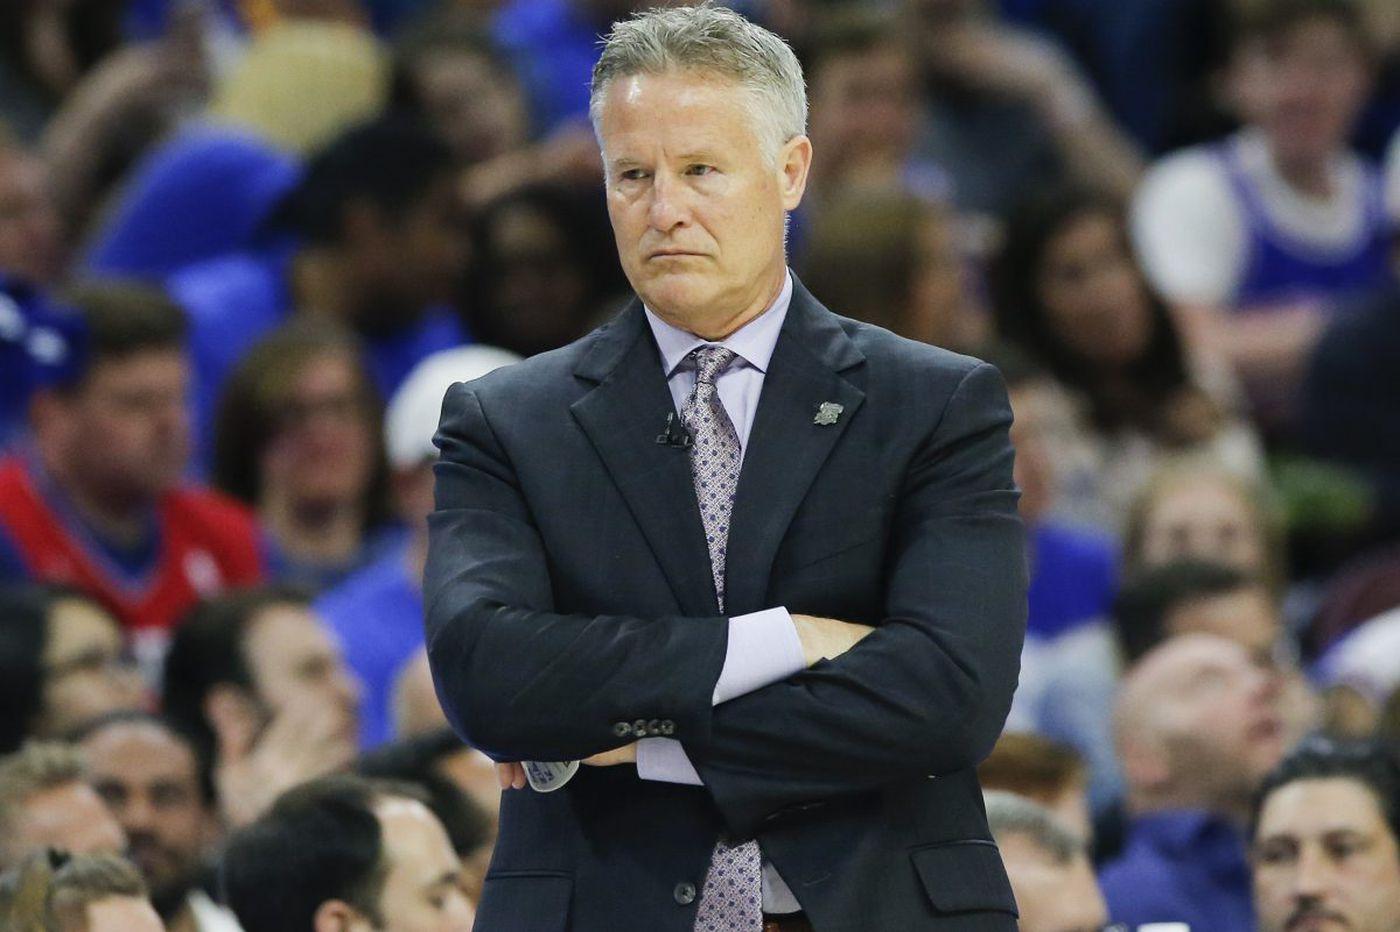 Sixers-Heat Game 2 will start the coaching battle between Brett Brown and Erik Spoelstra